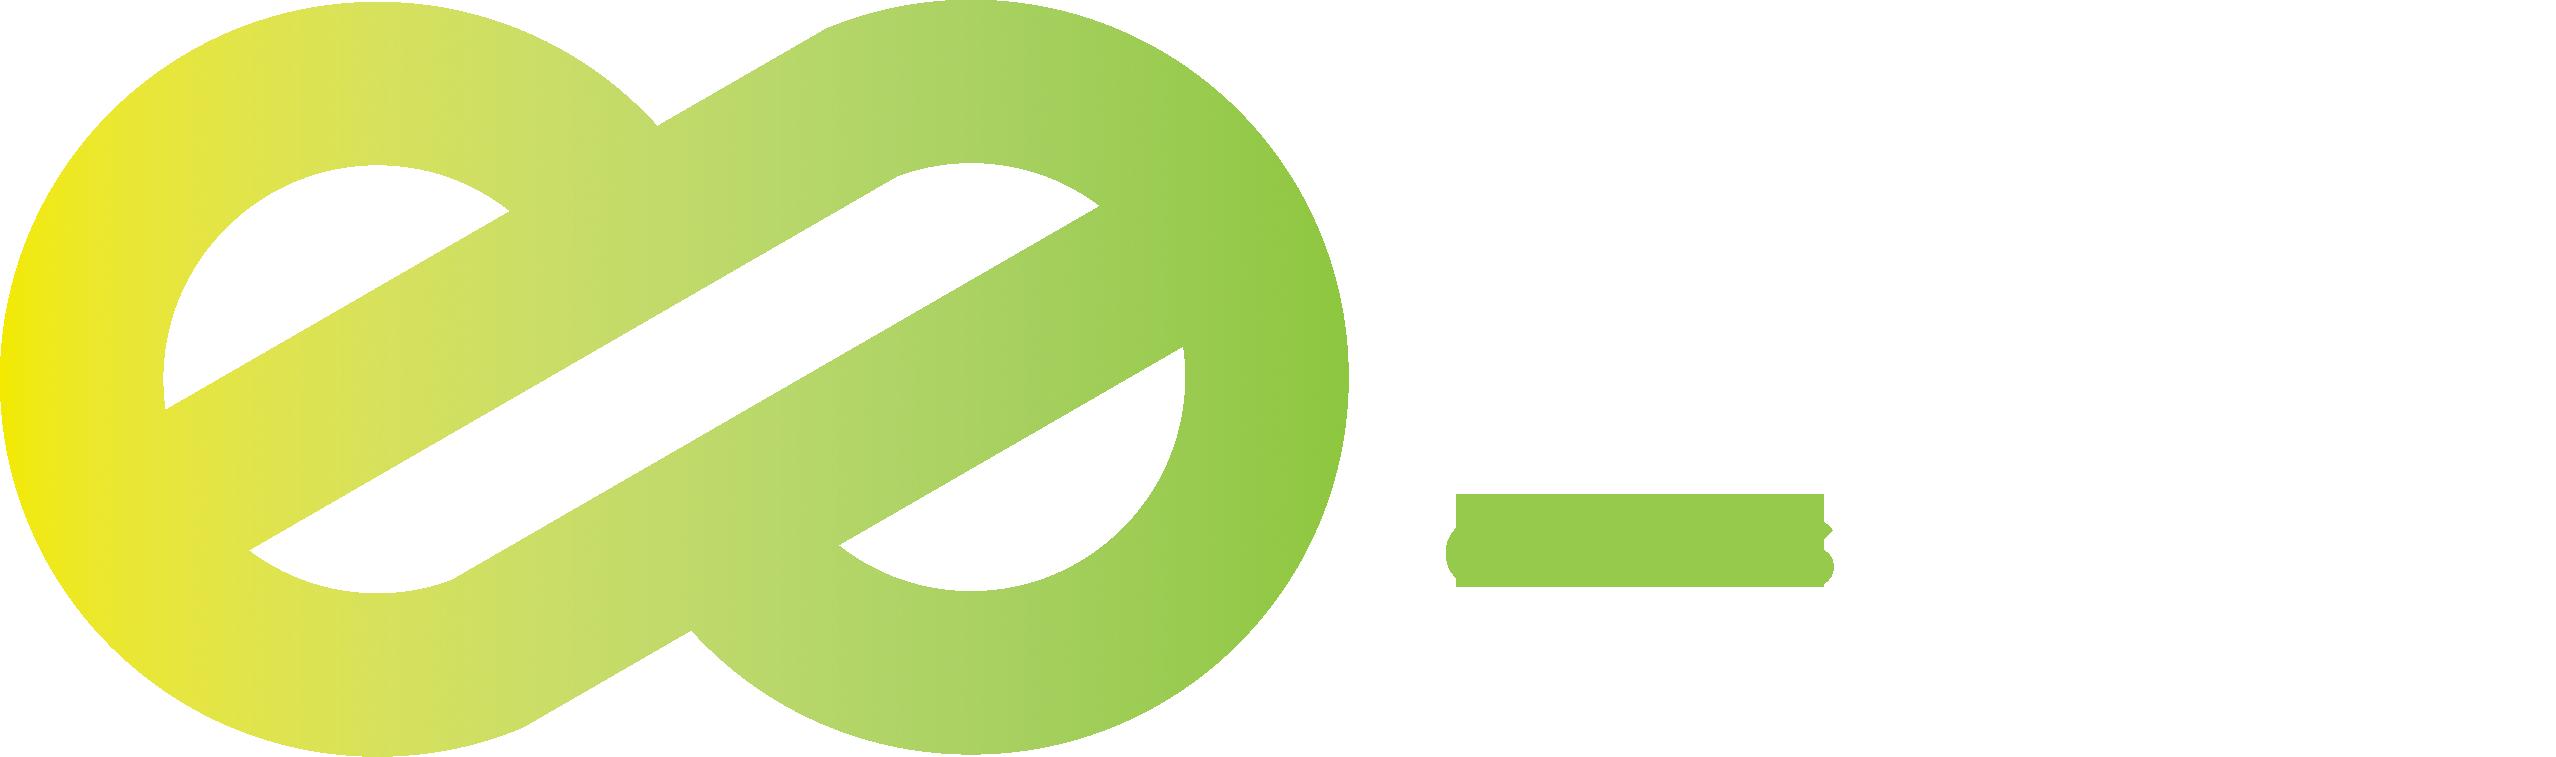 Endless Events logo